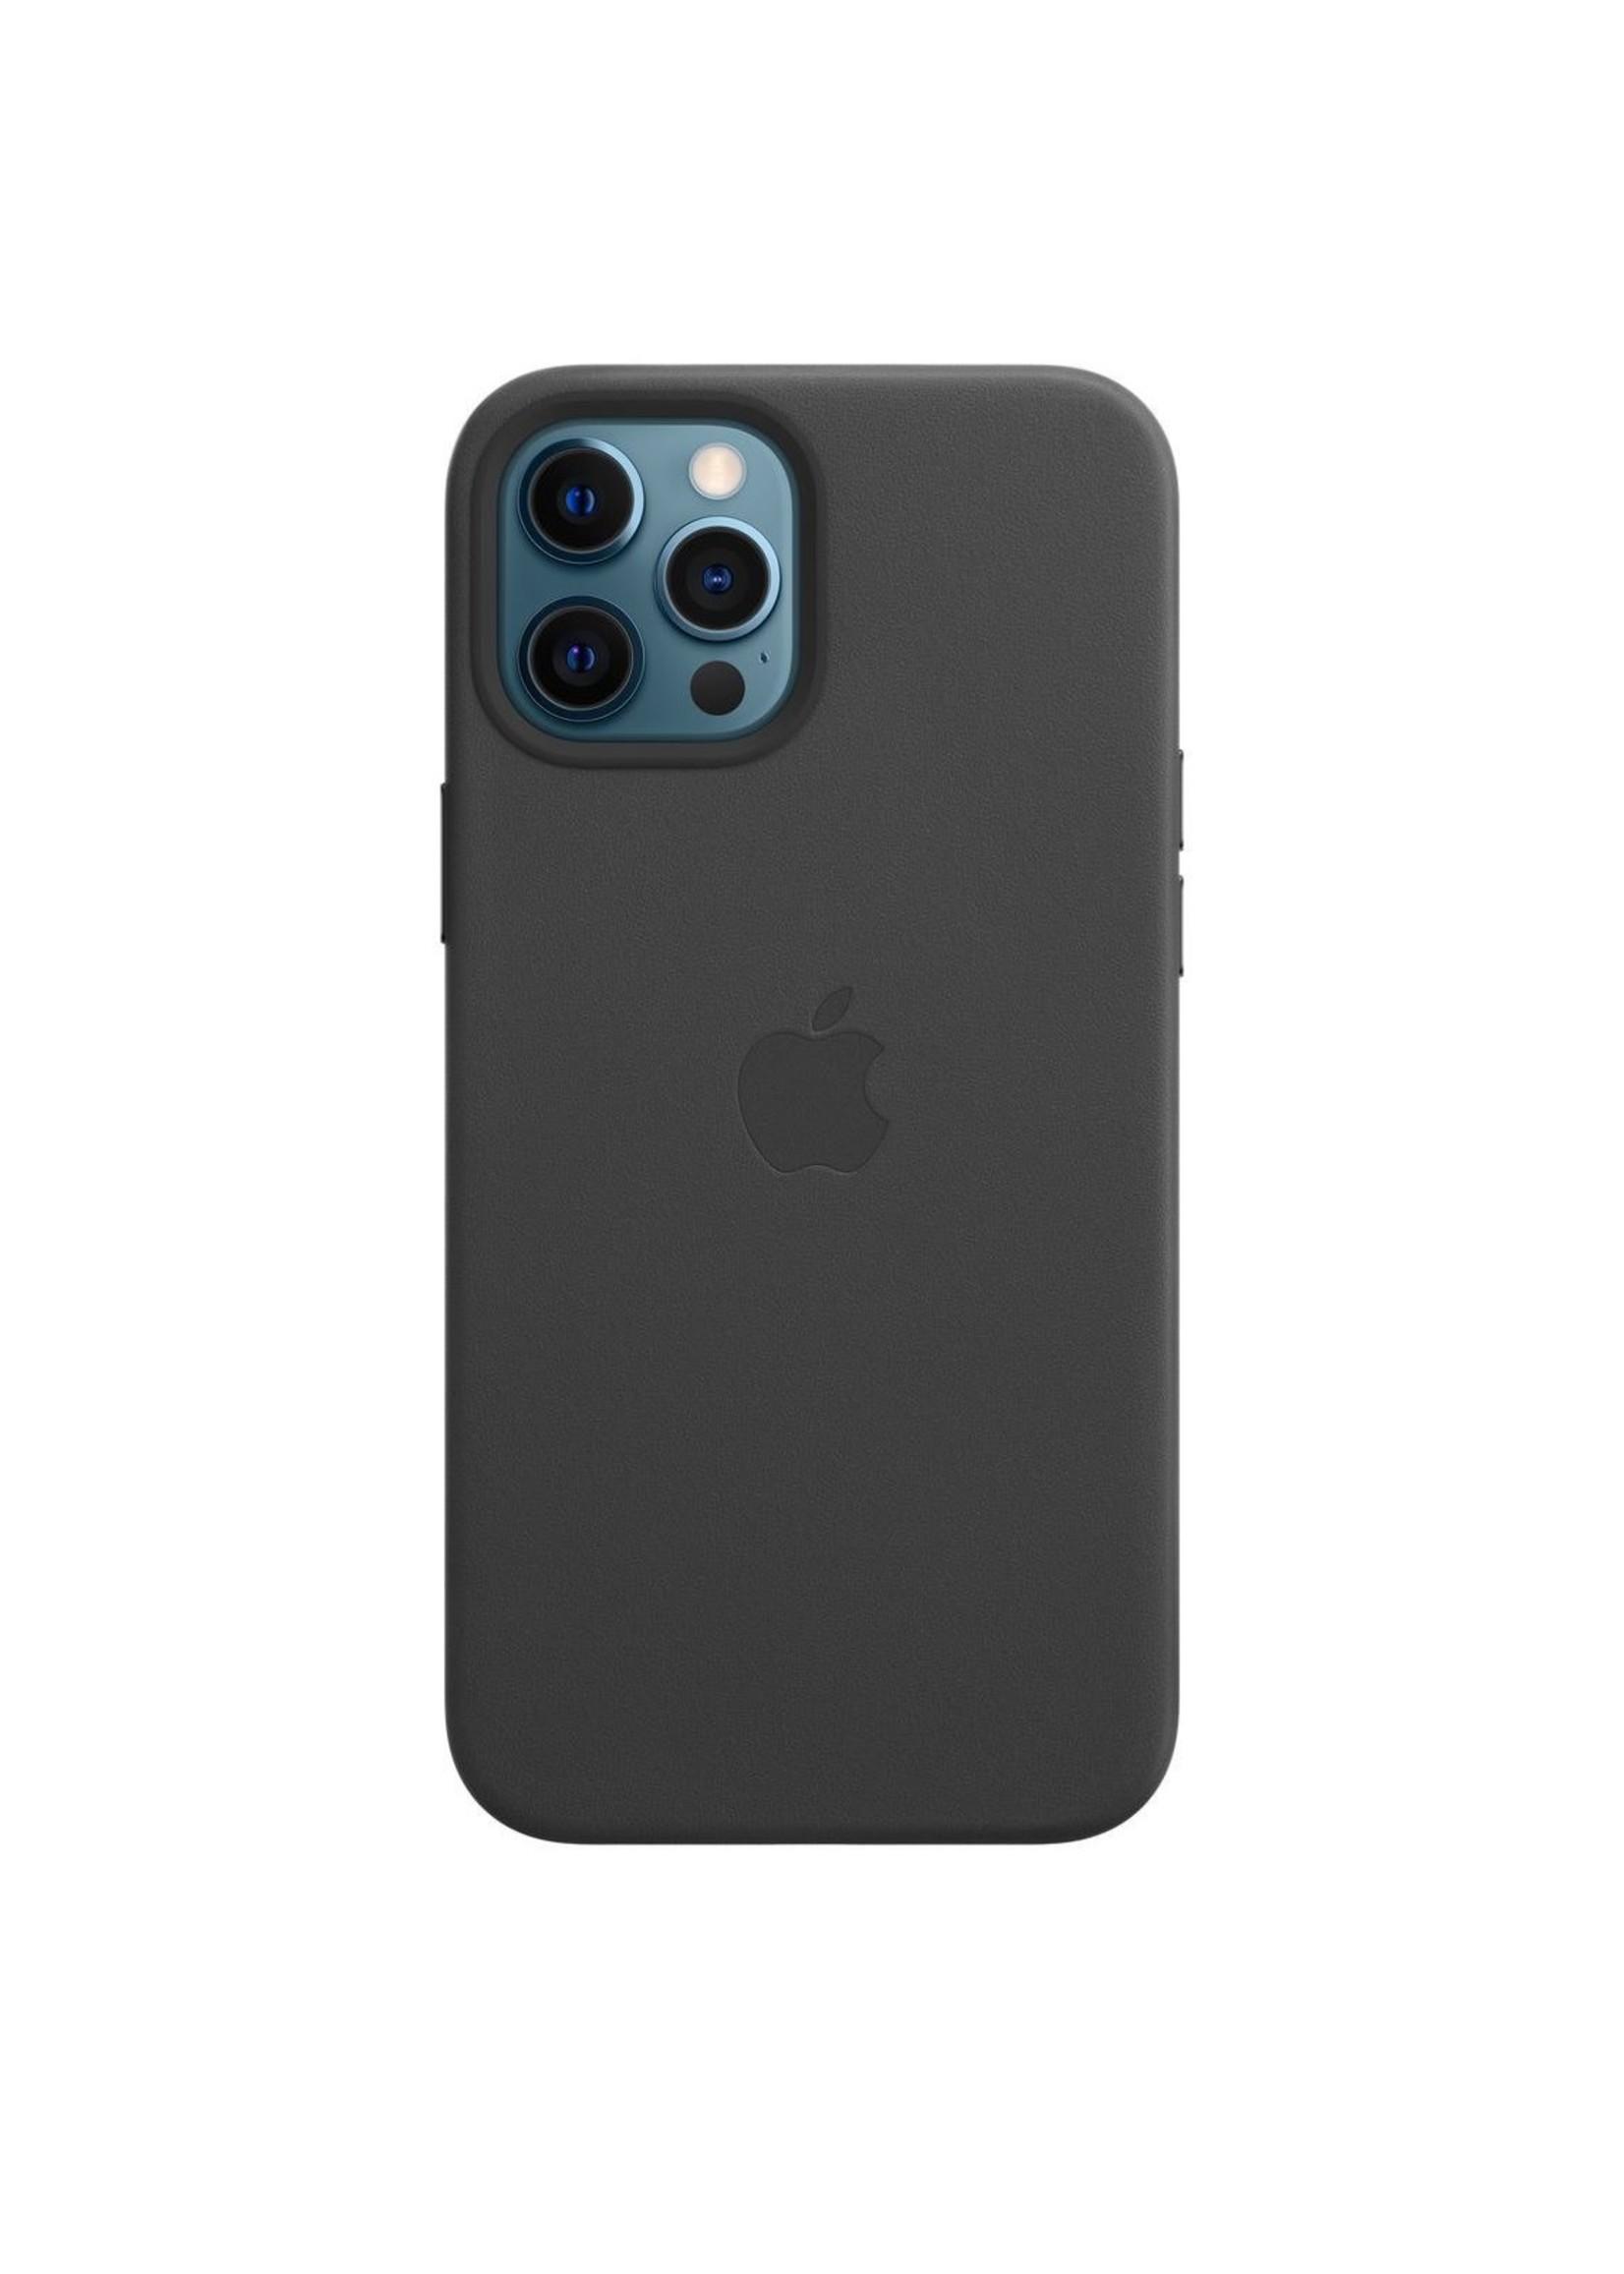 Apple iPhone 12 Pro Max Leather Case Black